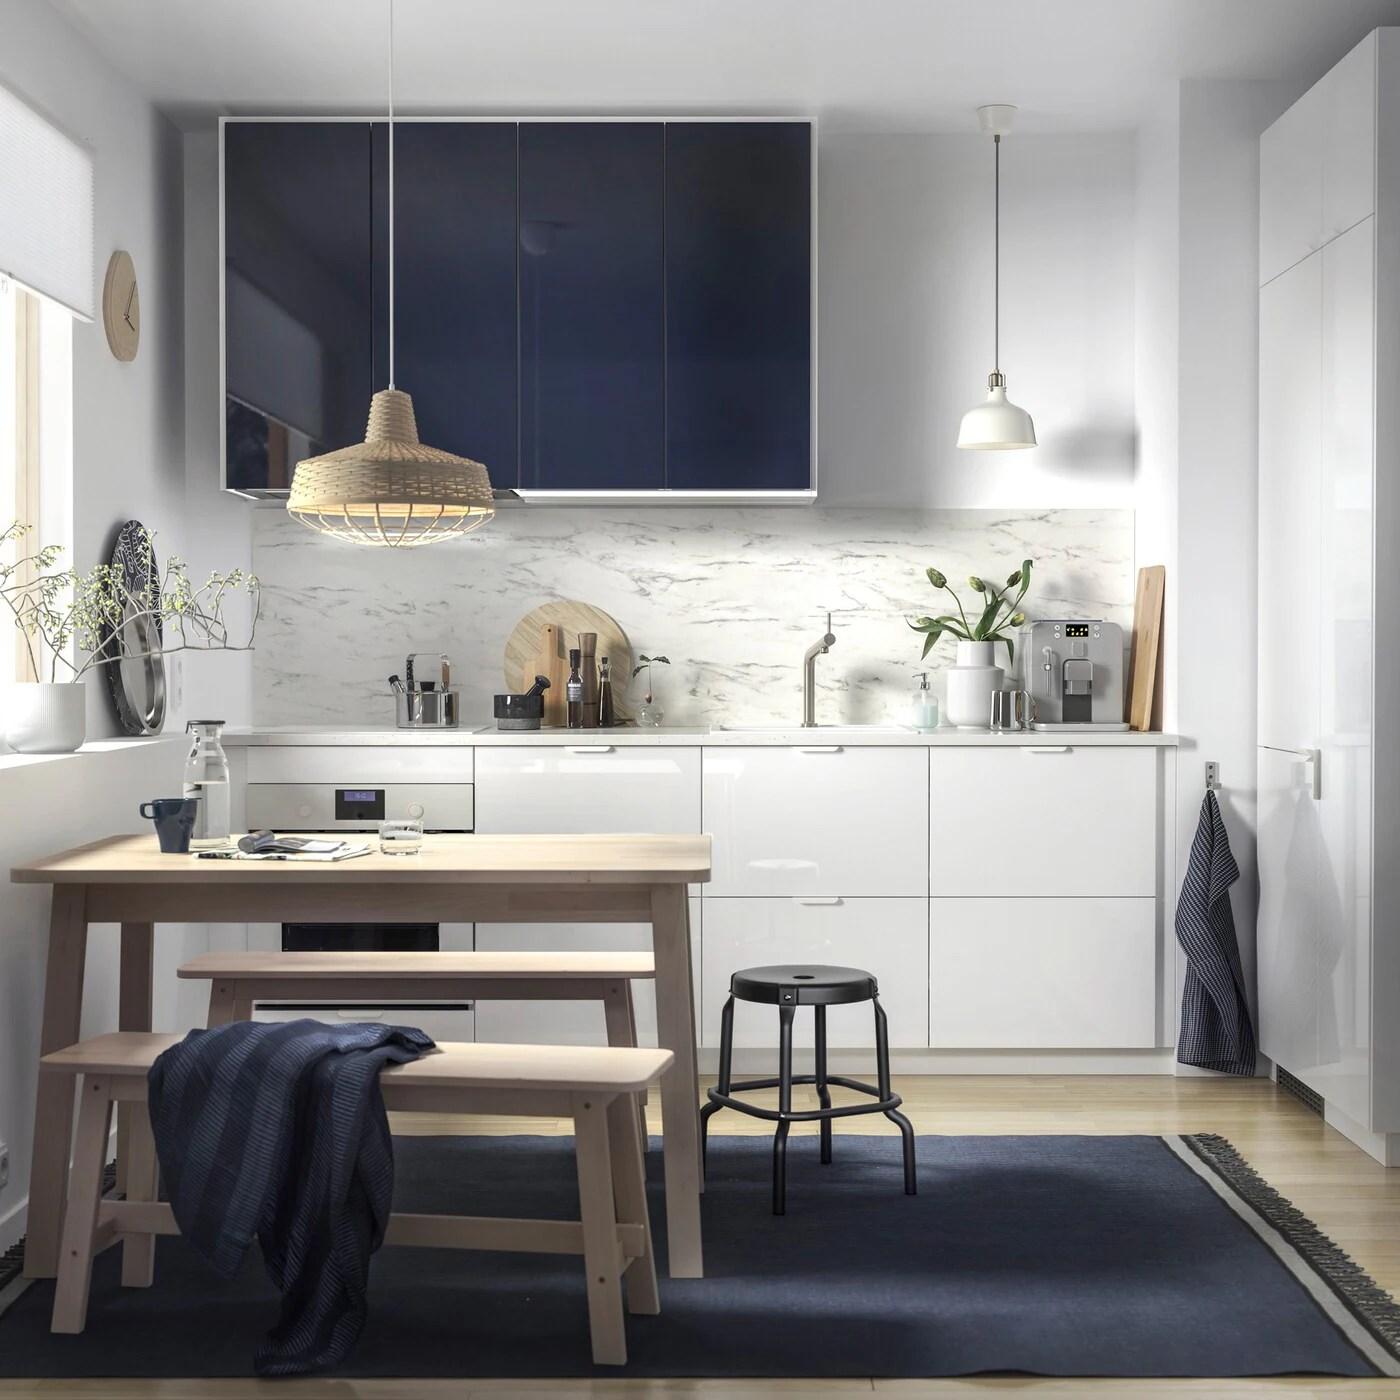 Furniture Decorative Items And Home Furnishings Ikea